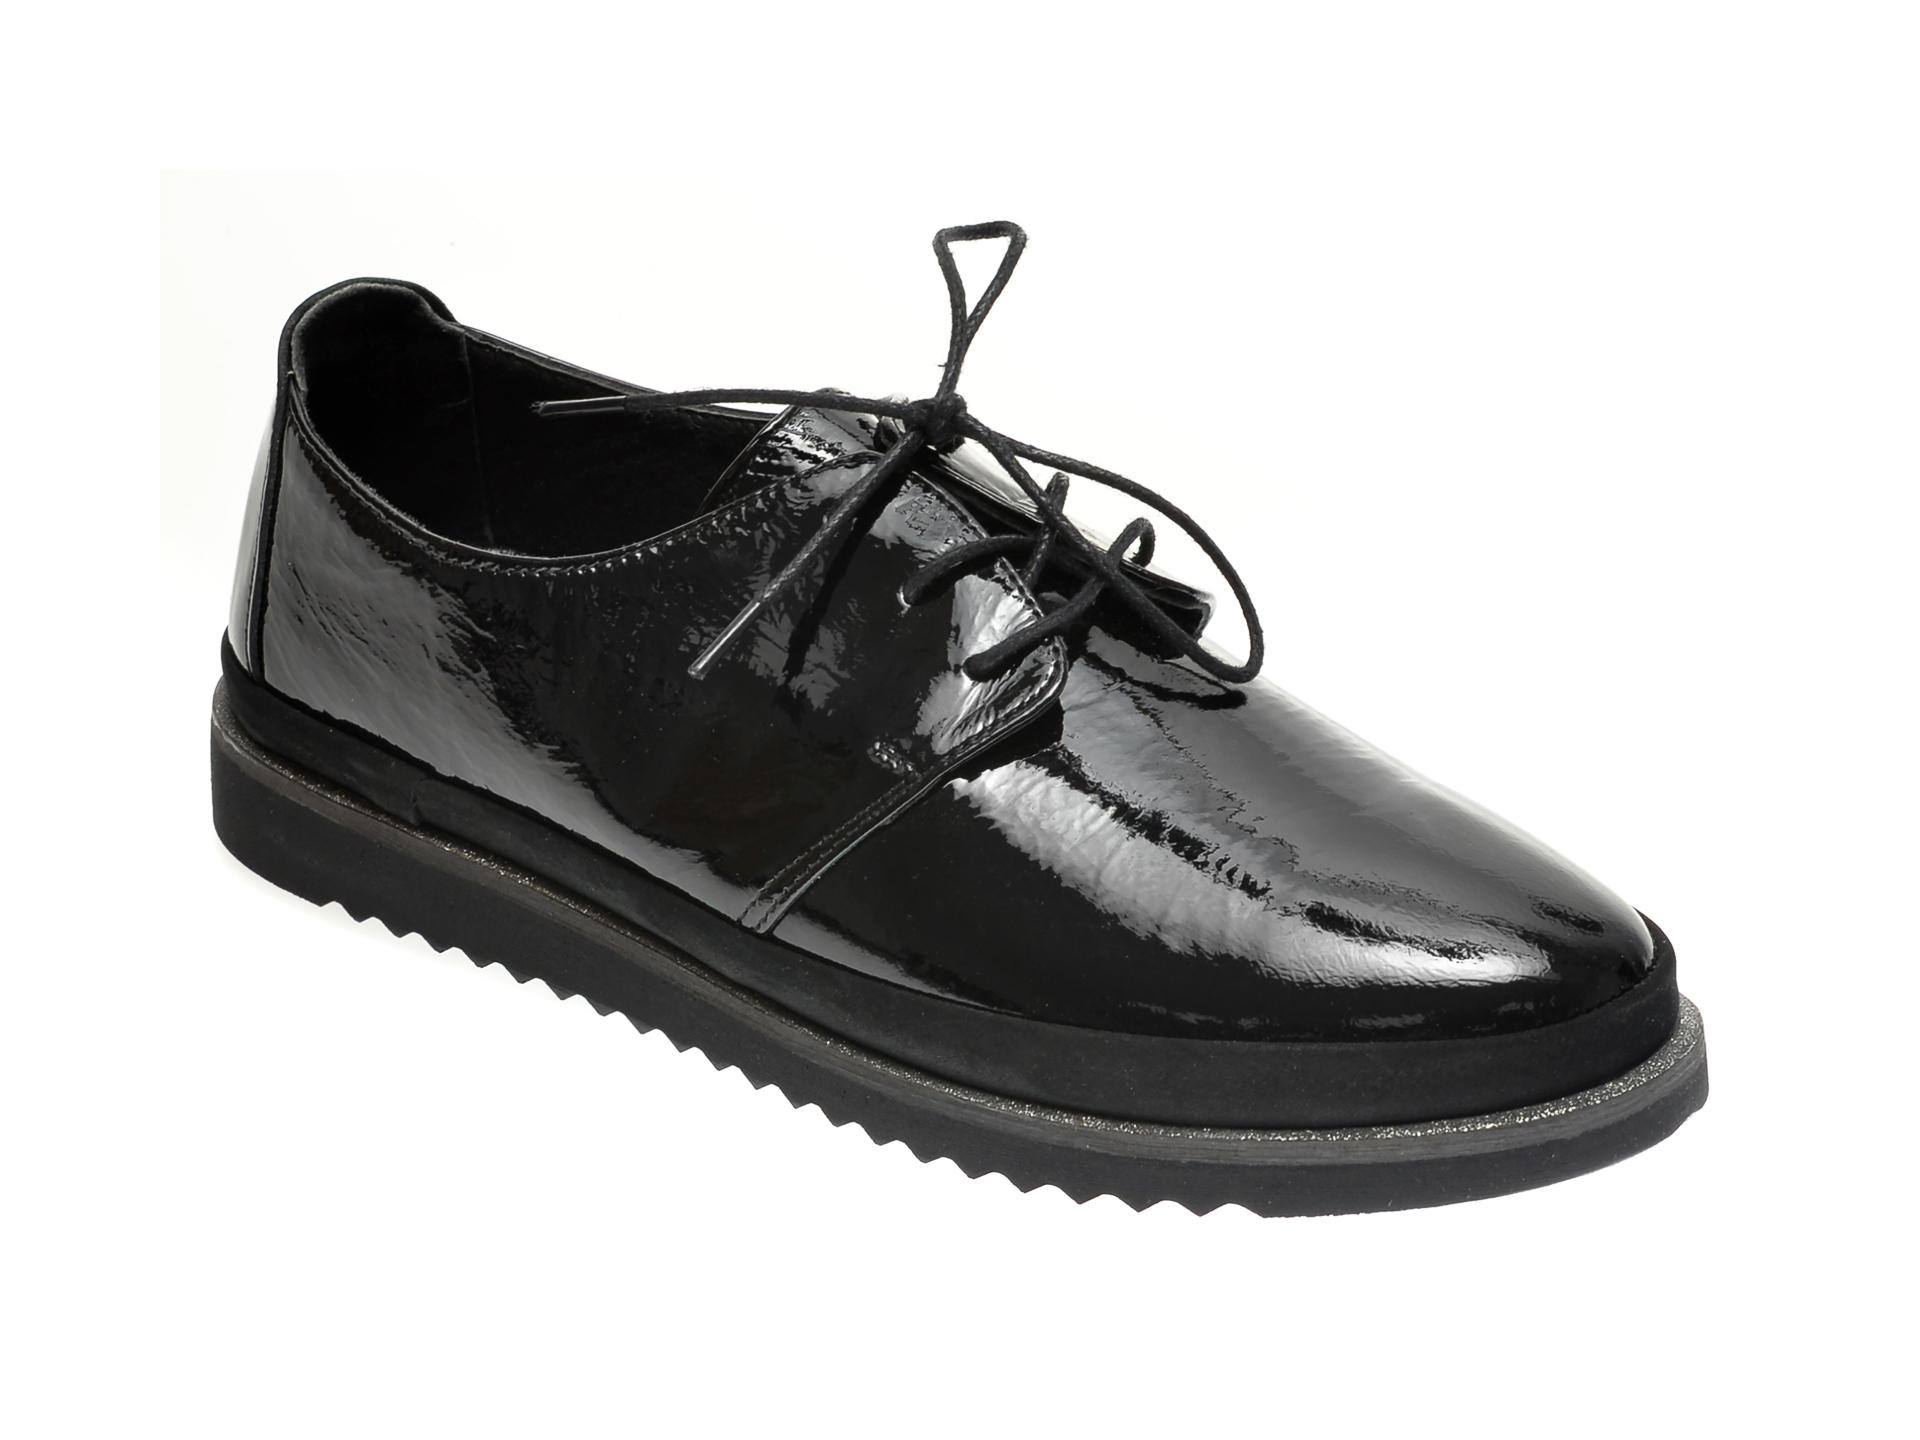 Pantofi ILOZ negri, 8009, din piele naturala lacuita imagine